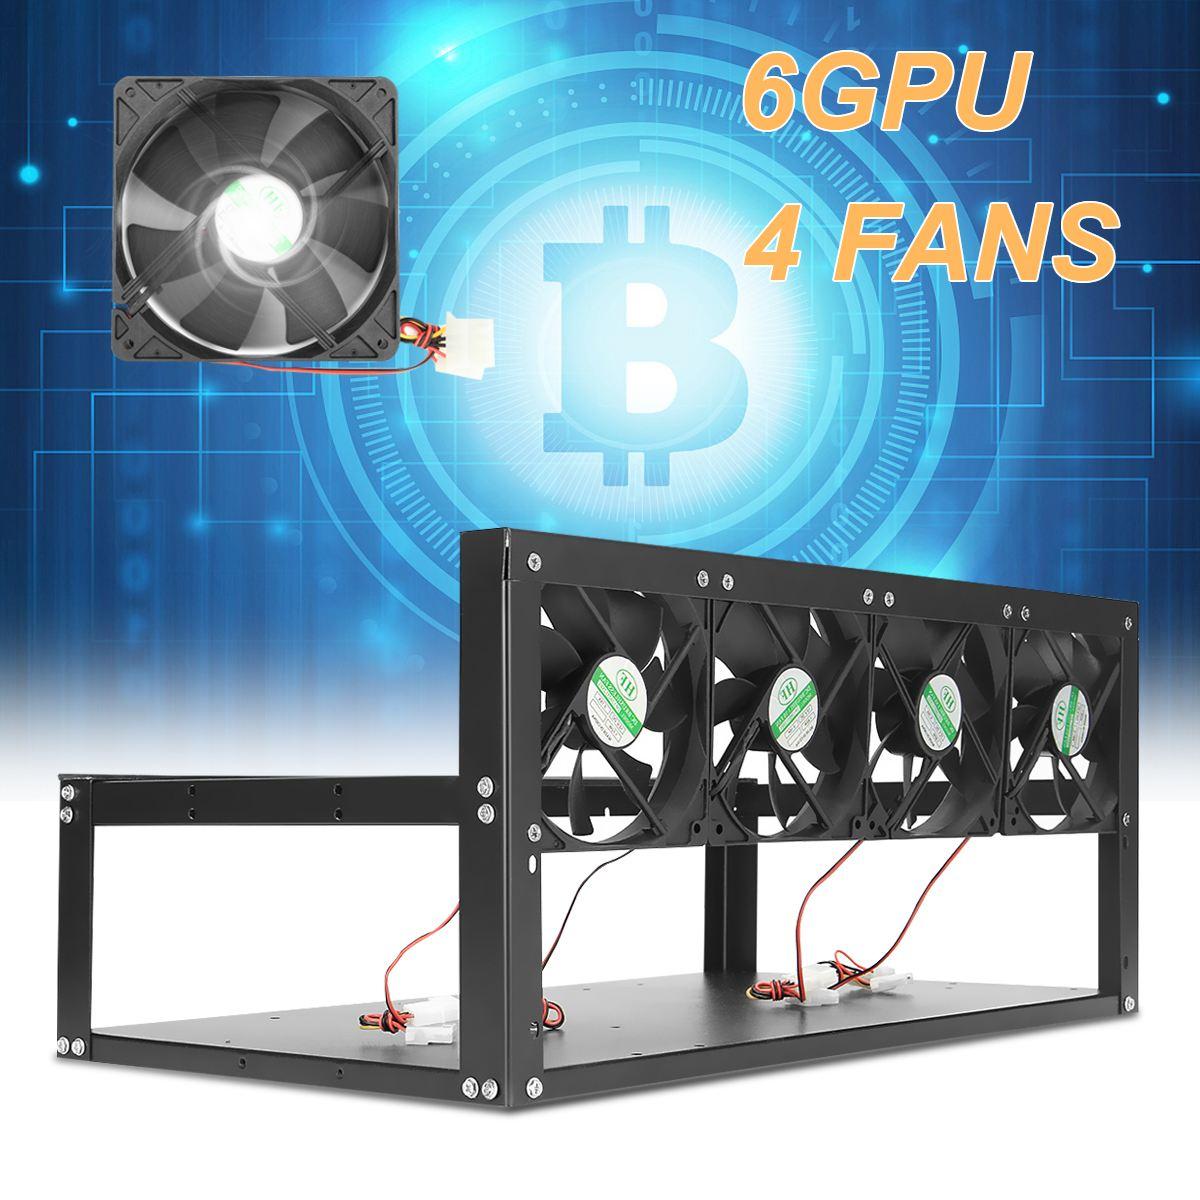 6 GPU 4 Fans Open Air Pro Mining Computer Alloy Case Frame